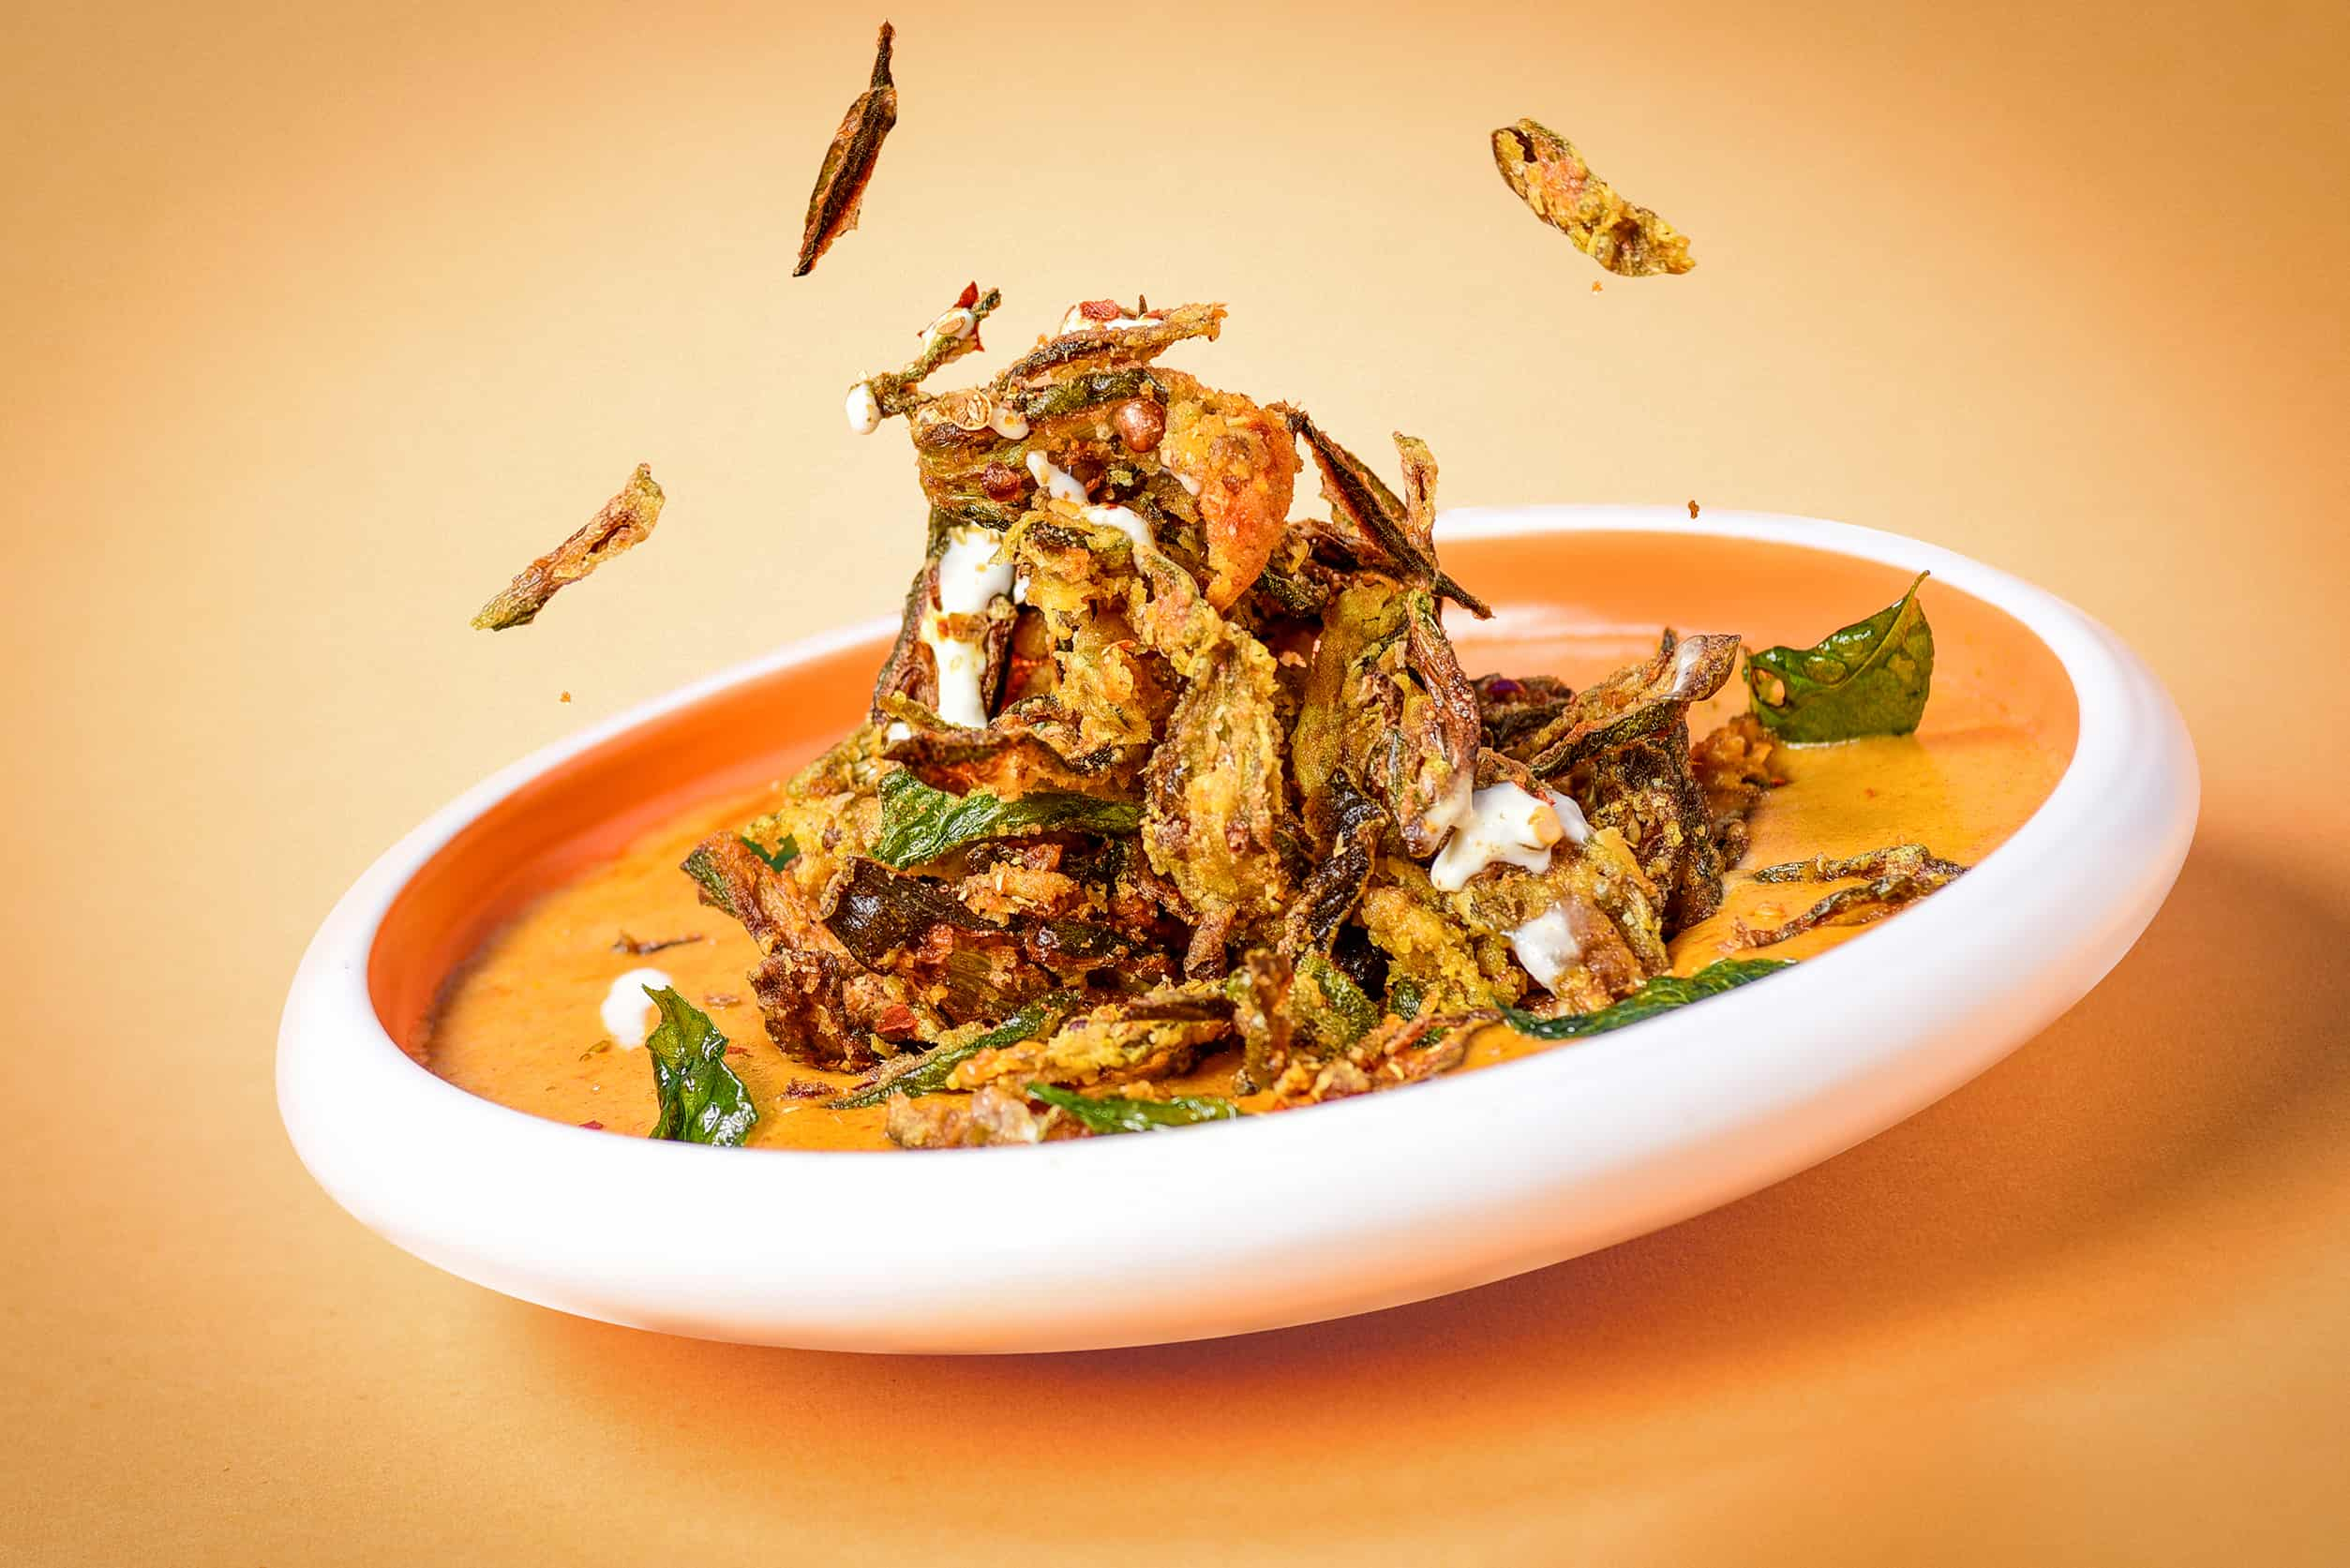 Singapore food photographer - Himani